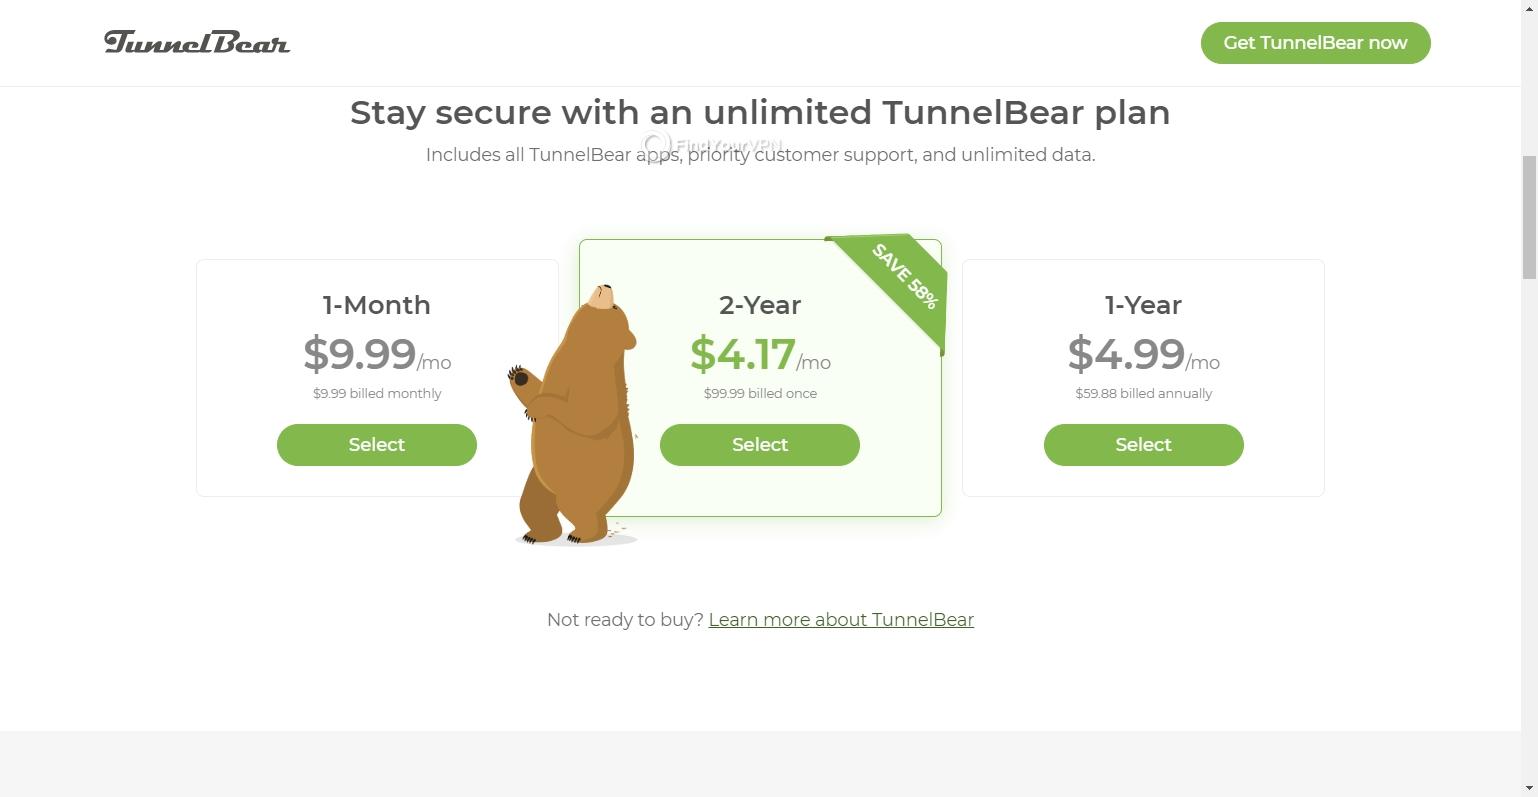 Choose a TunnelBear plan